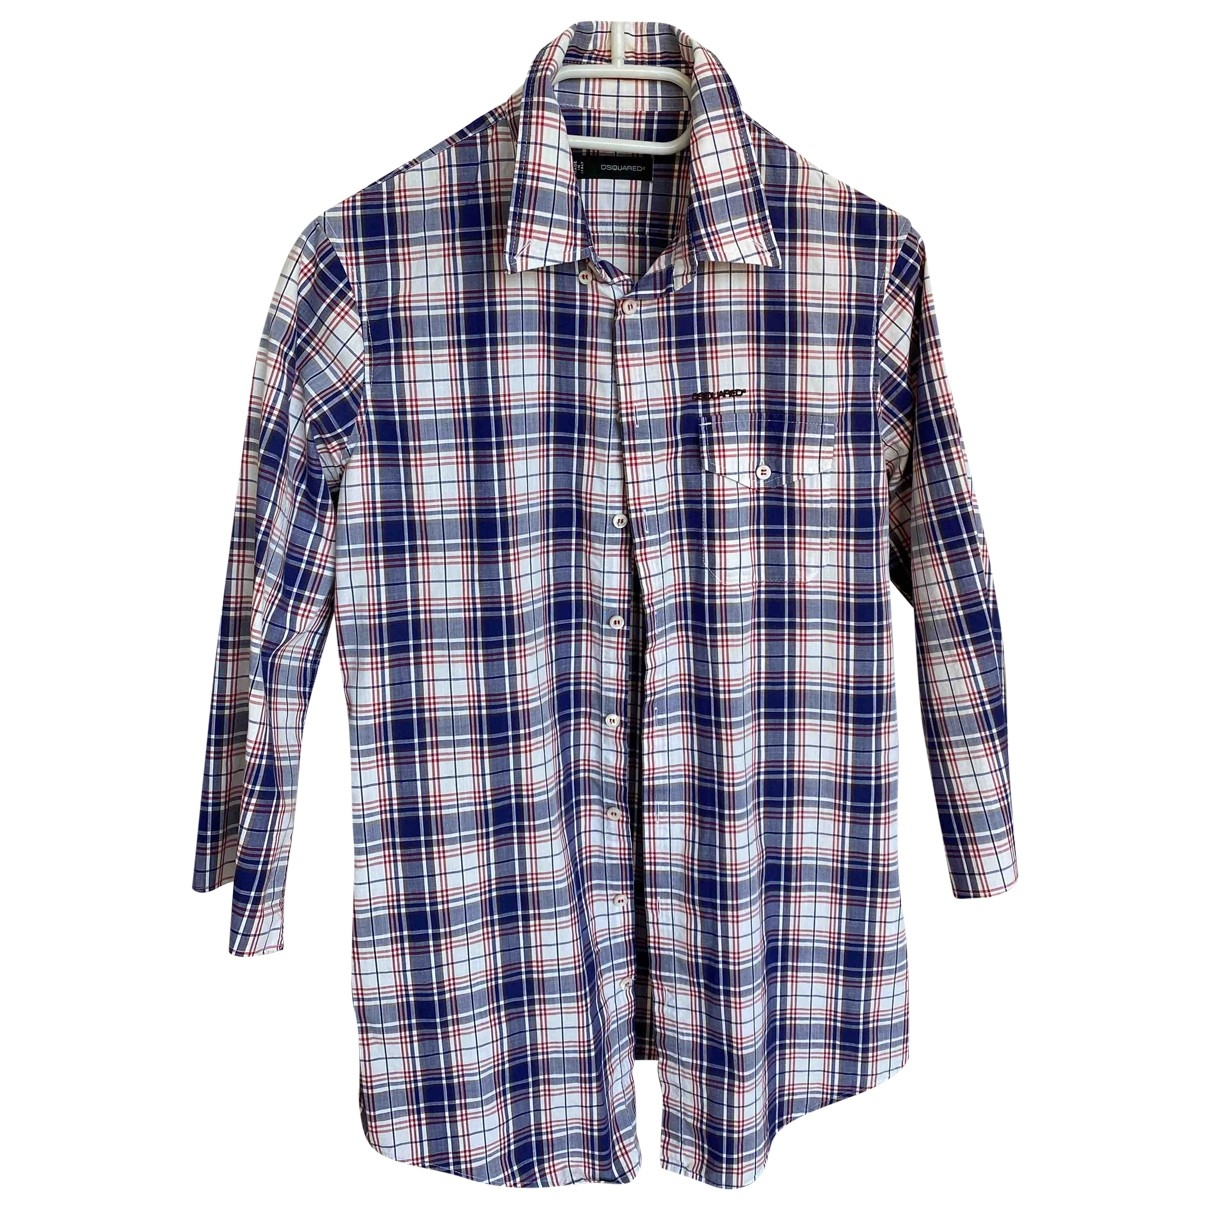 Dsquared2 \N Blue Cotton Shirts for Men S International